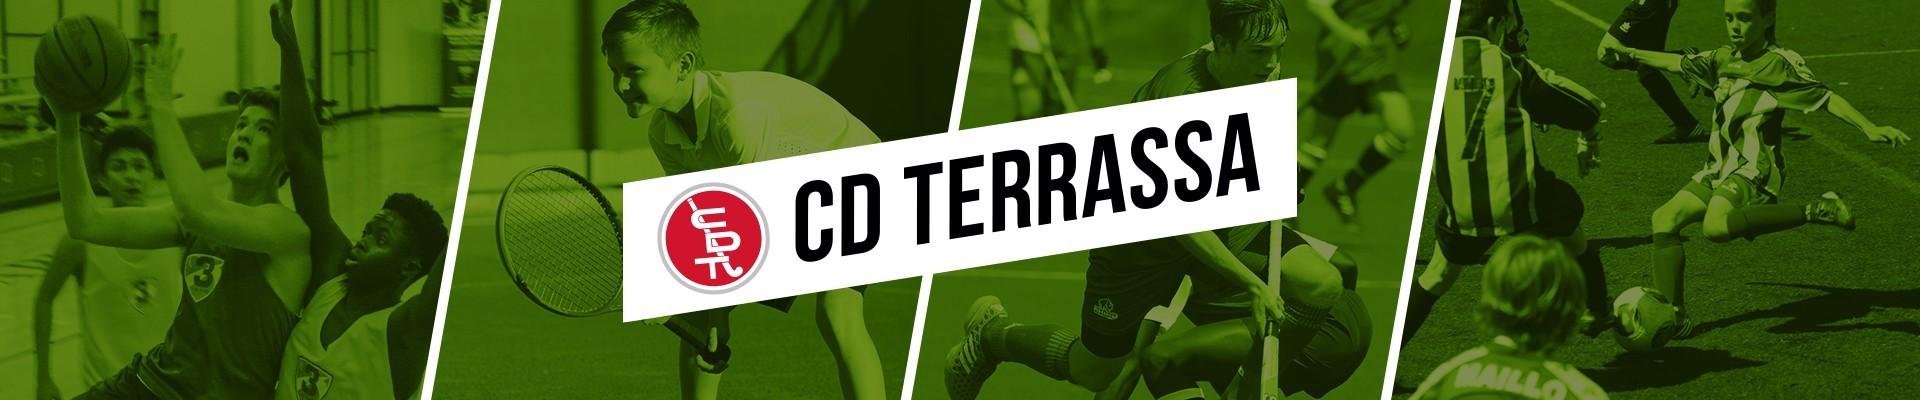 CD TERRASSA